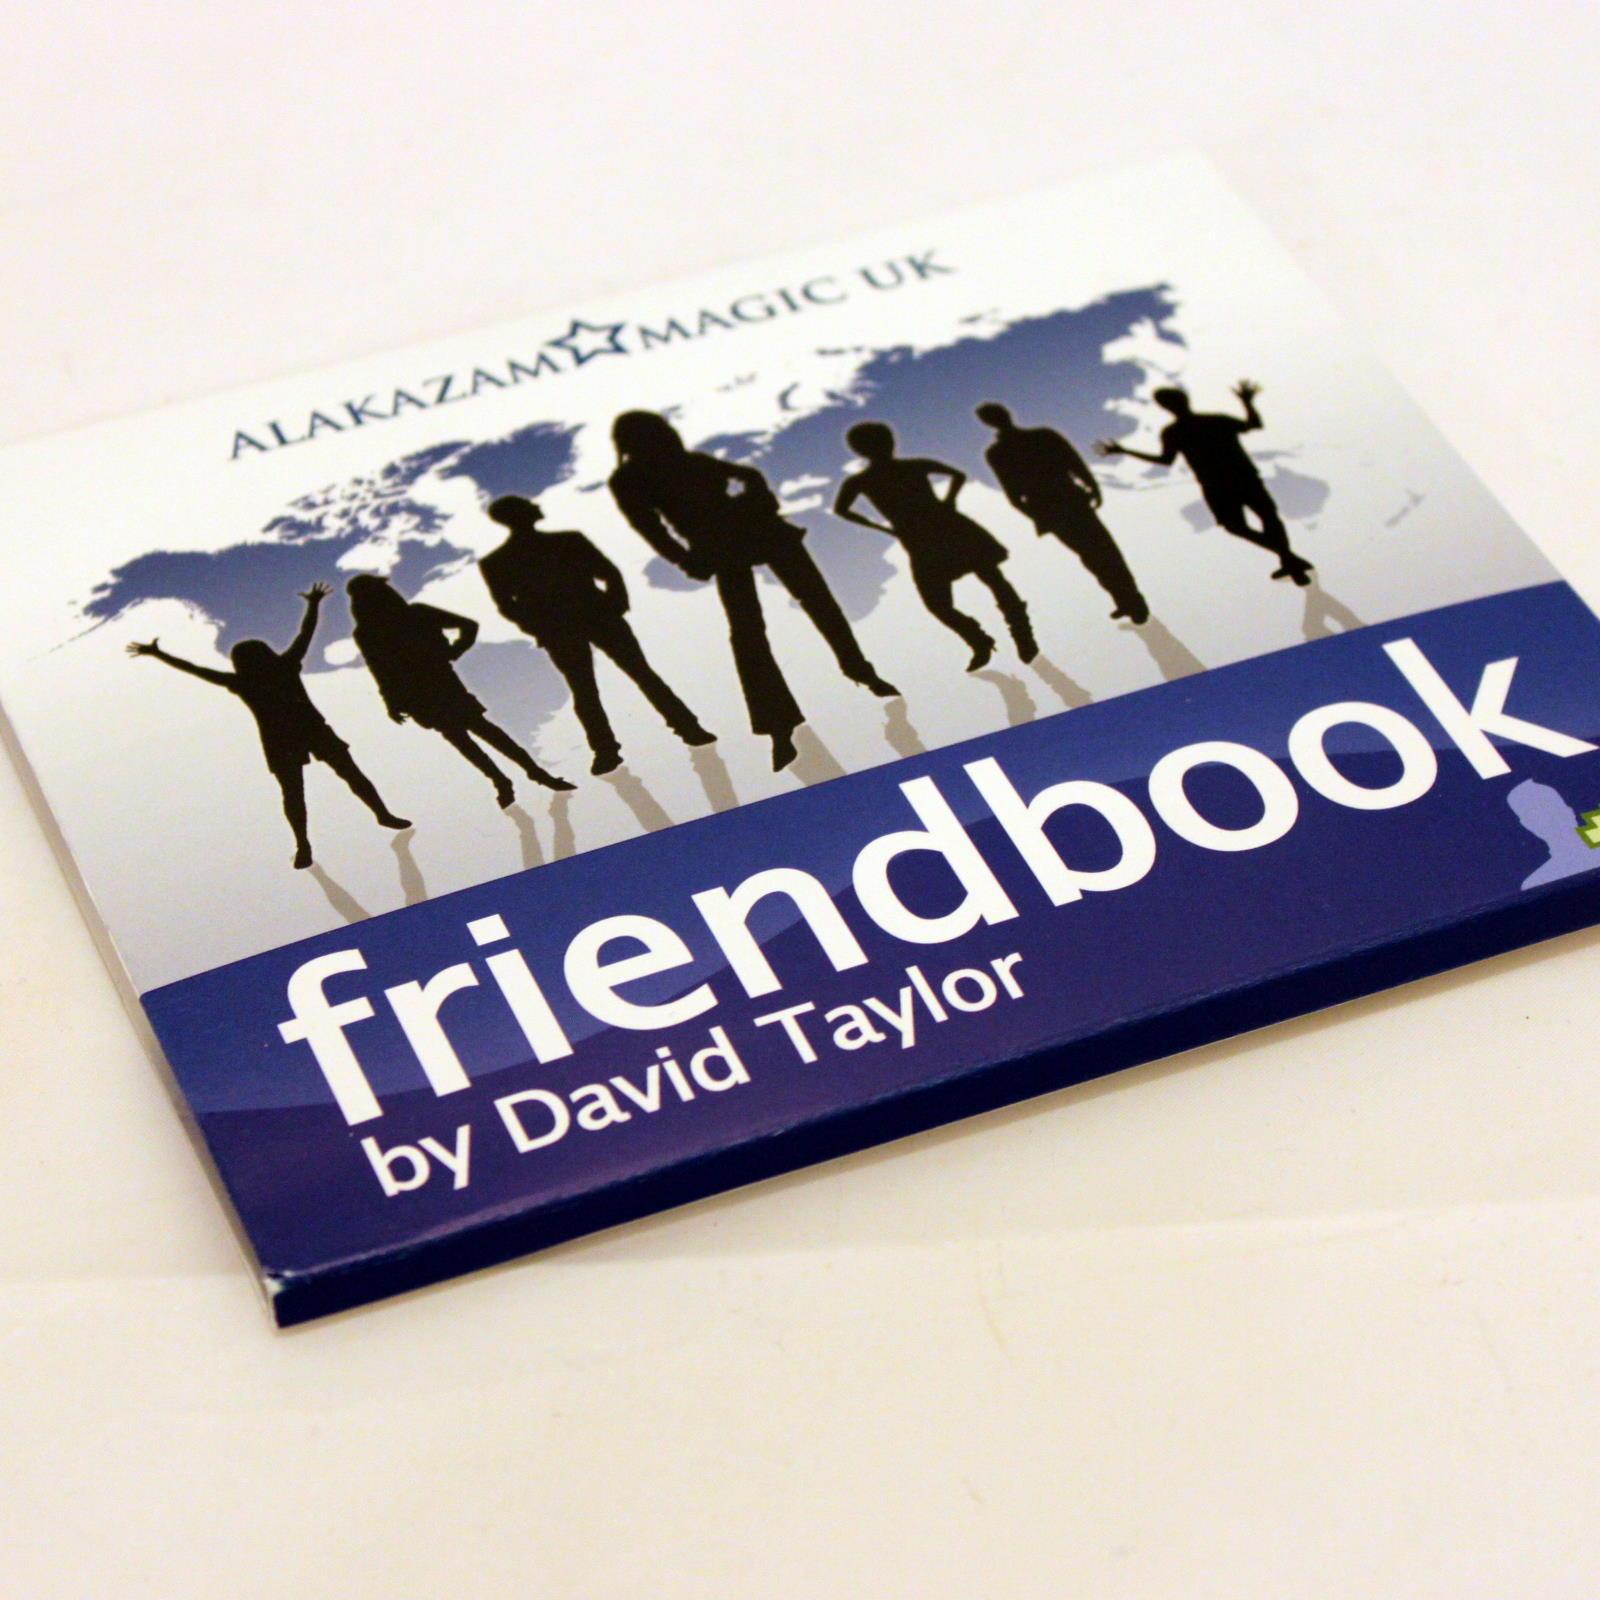 Friendbook by David Taylor